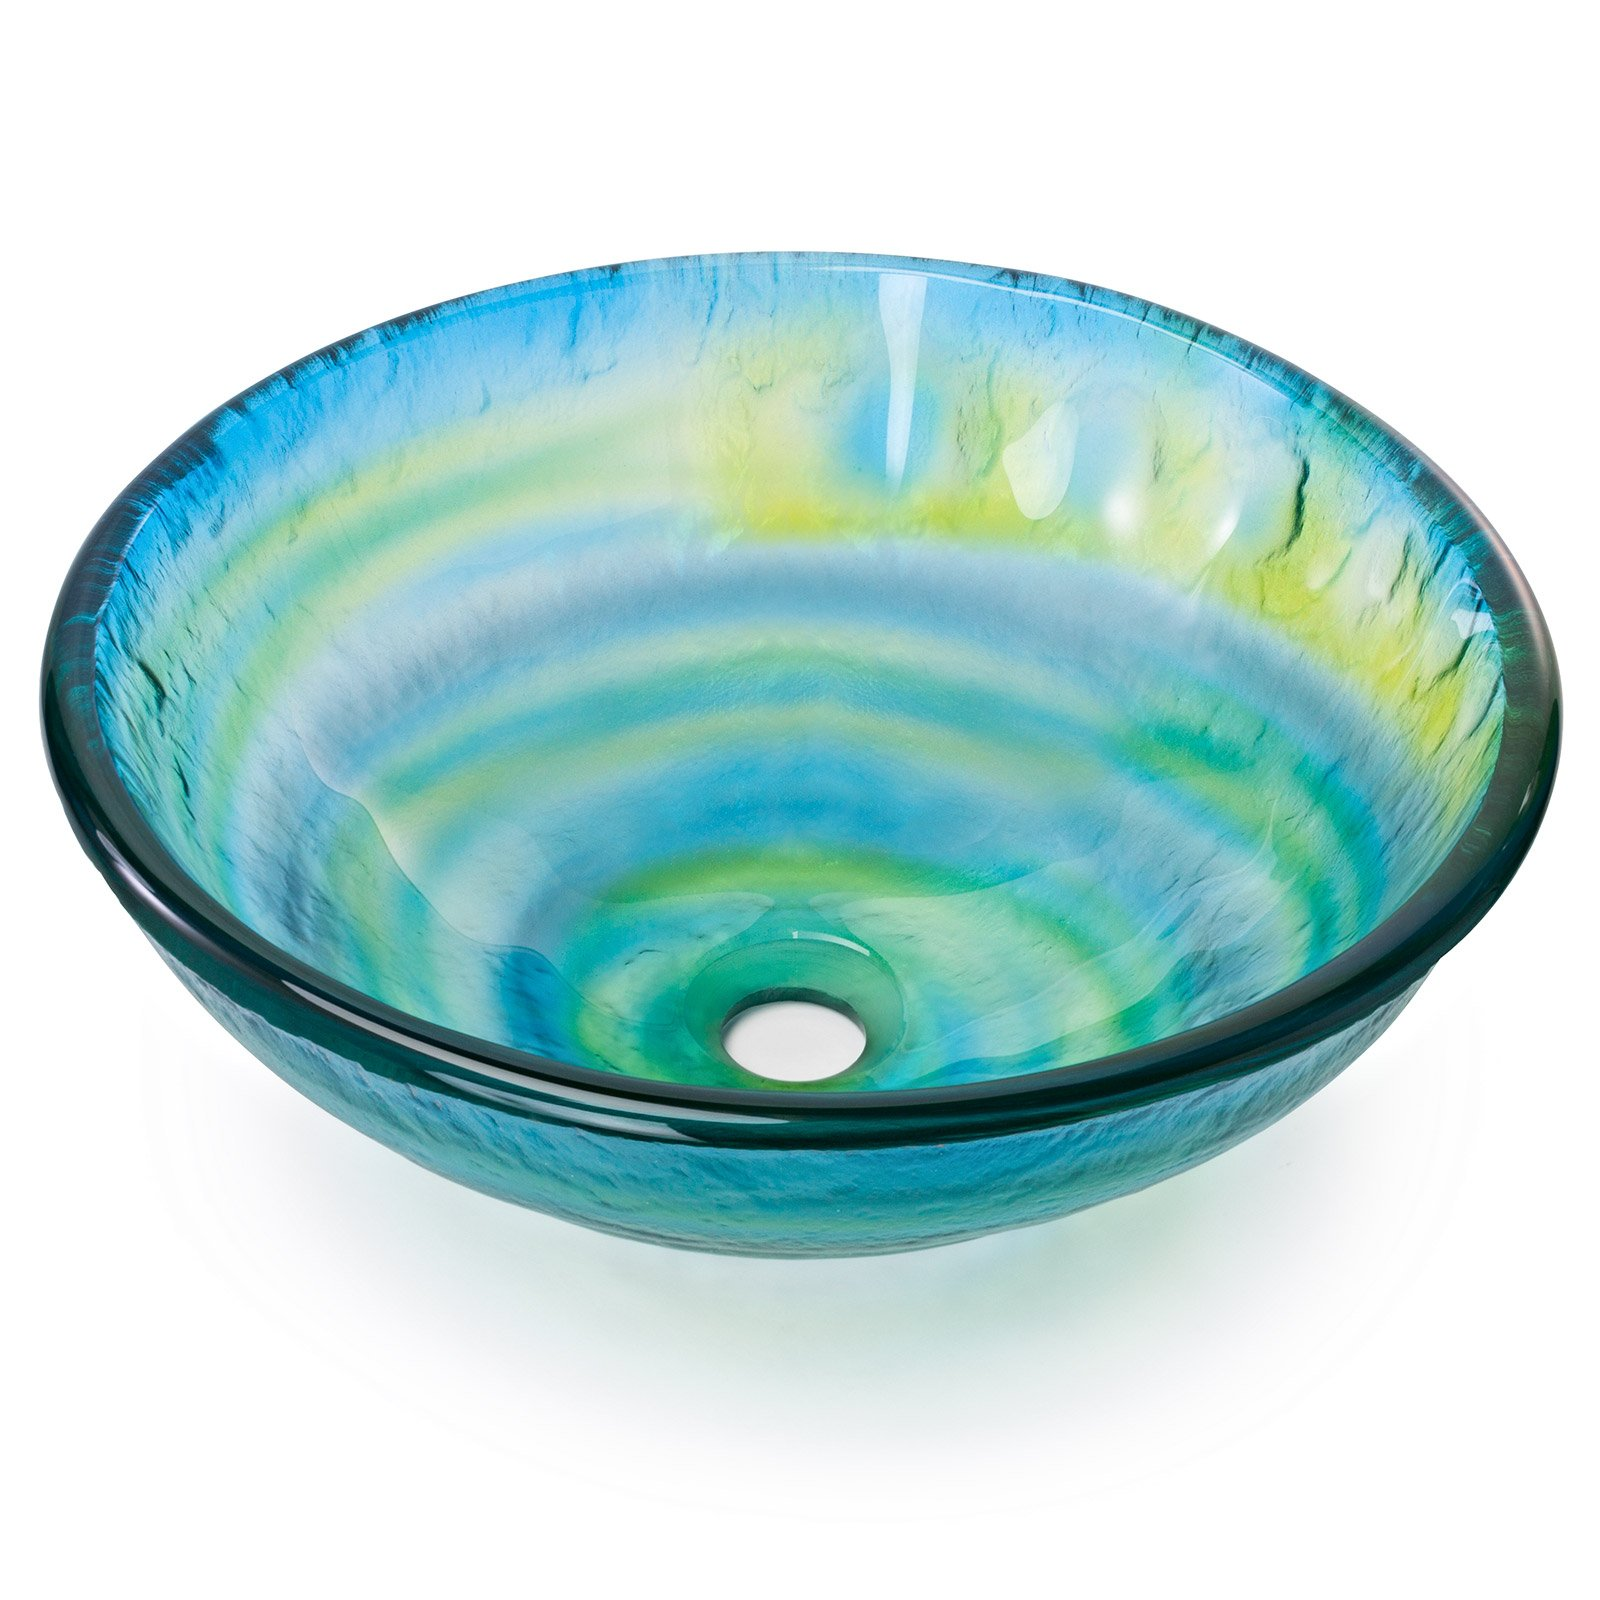 Miligoré Modern Glass Vessel Sink   Above Counter Bathroom Vanity Basin Bowl    Round Blue U0026